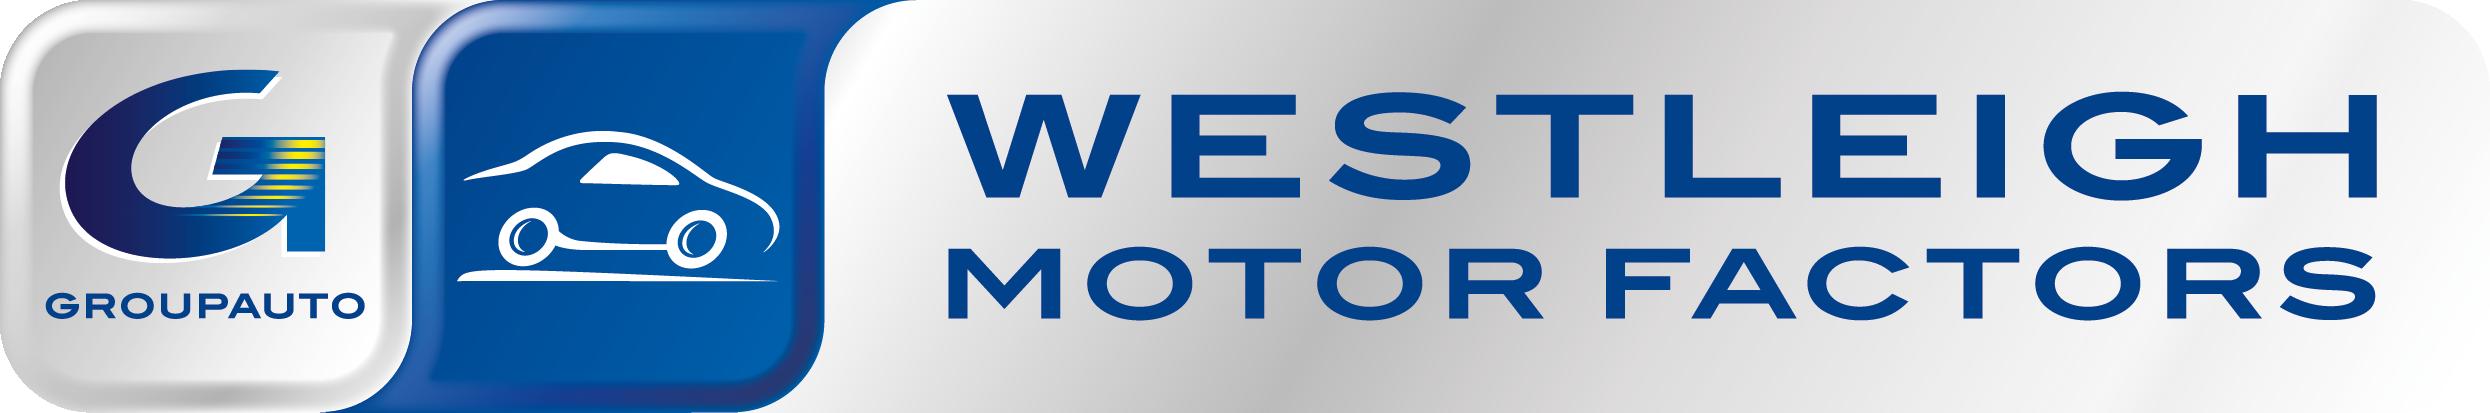 Westleigh Motor Factors